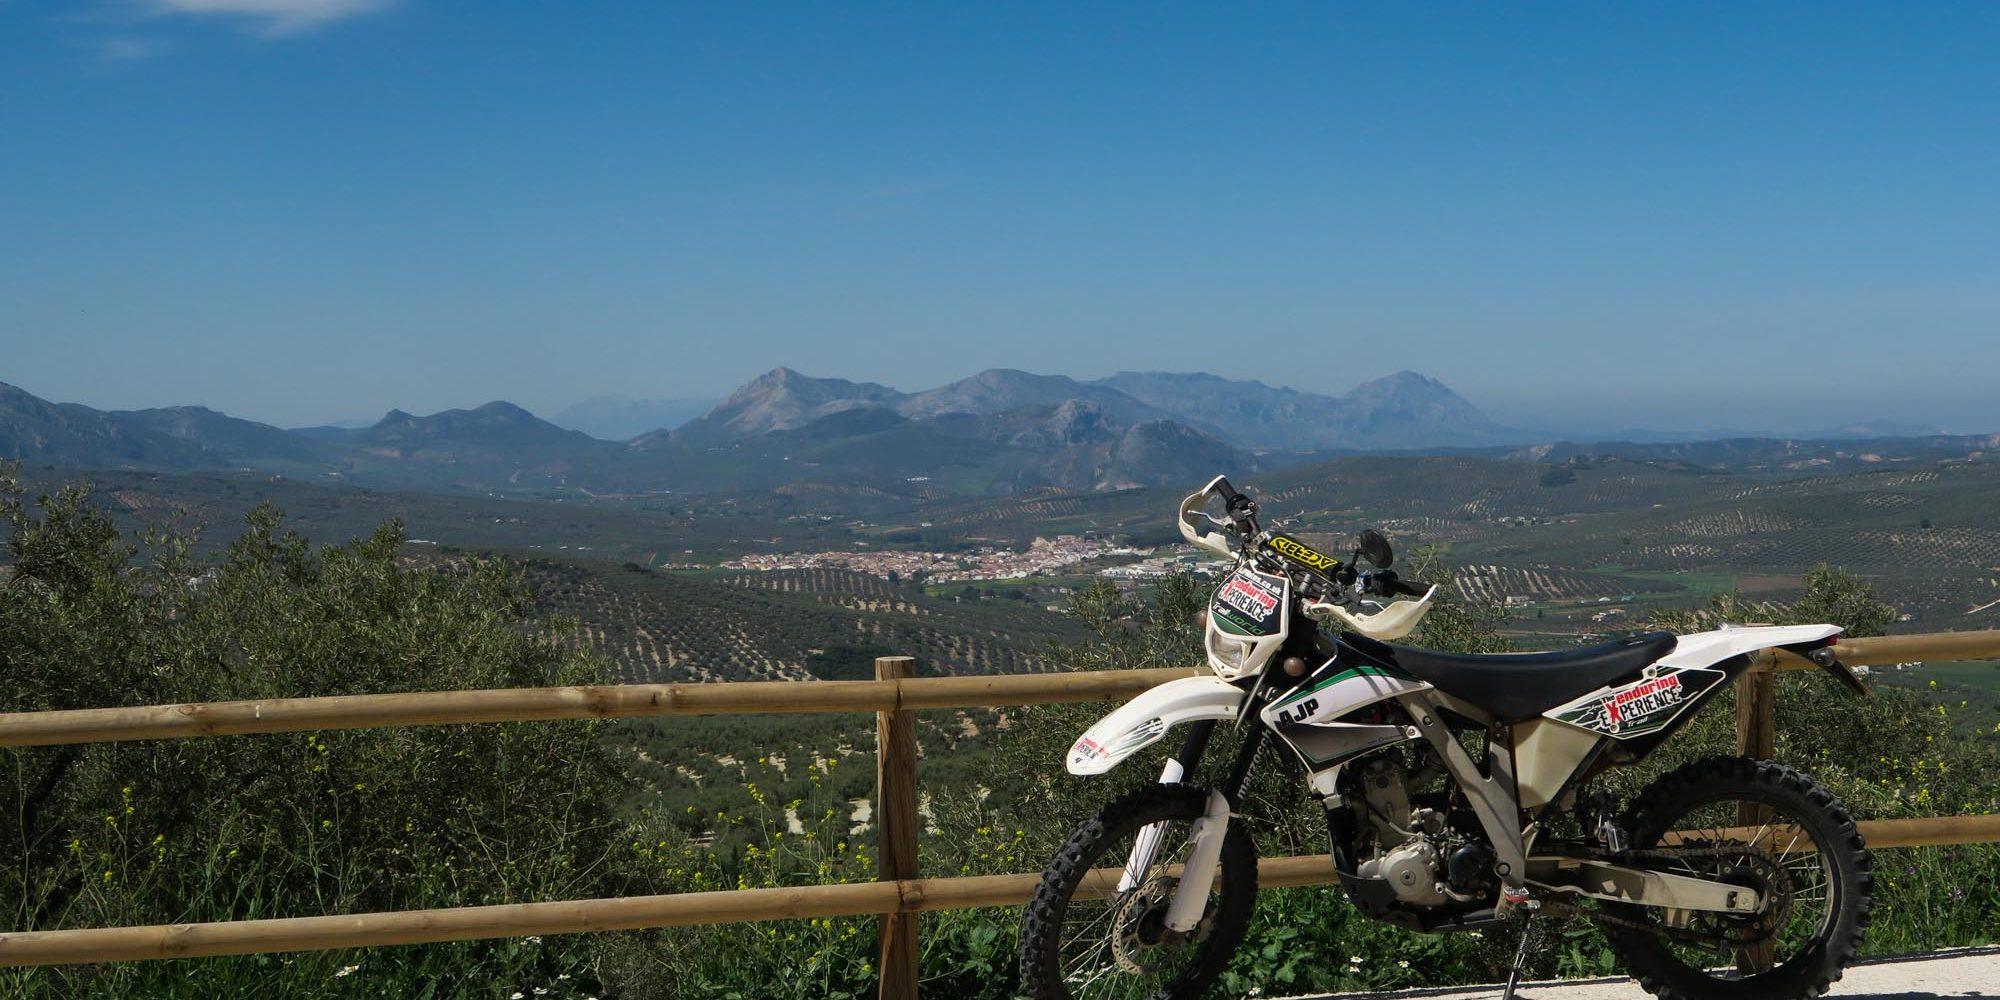 Enduro Motorcycle tours in Periana, near Malaga